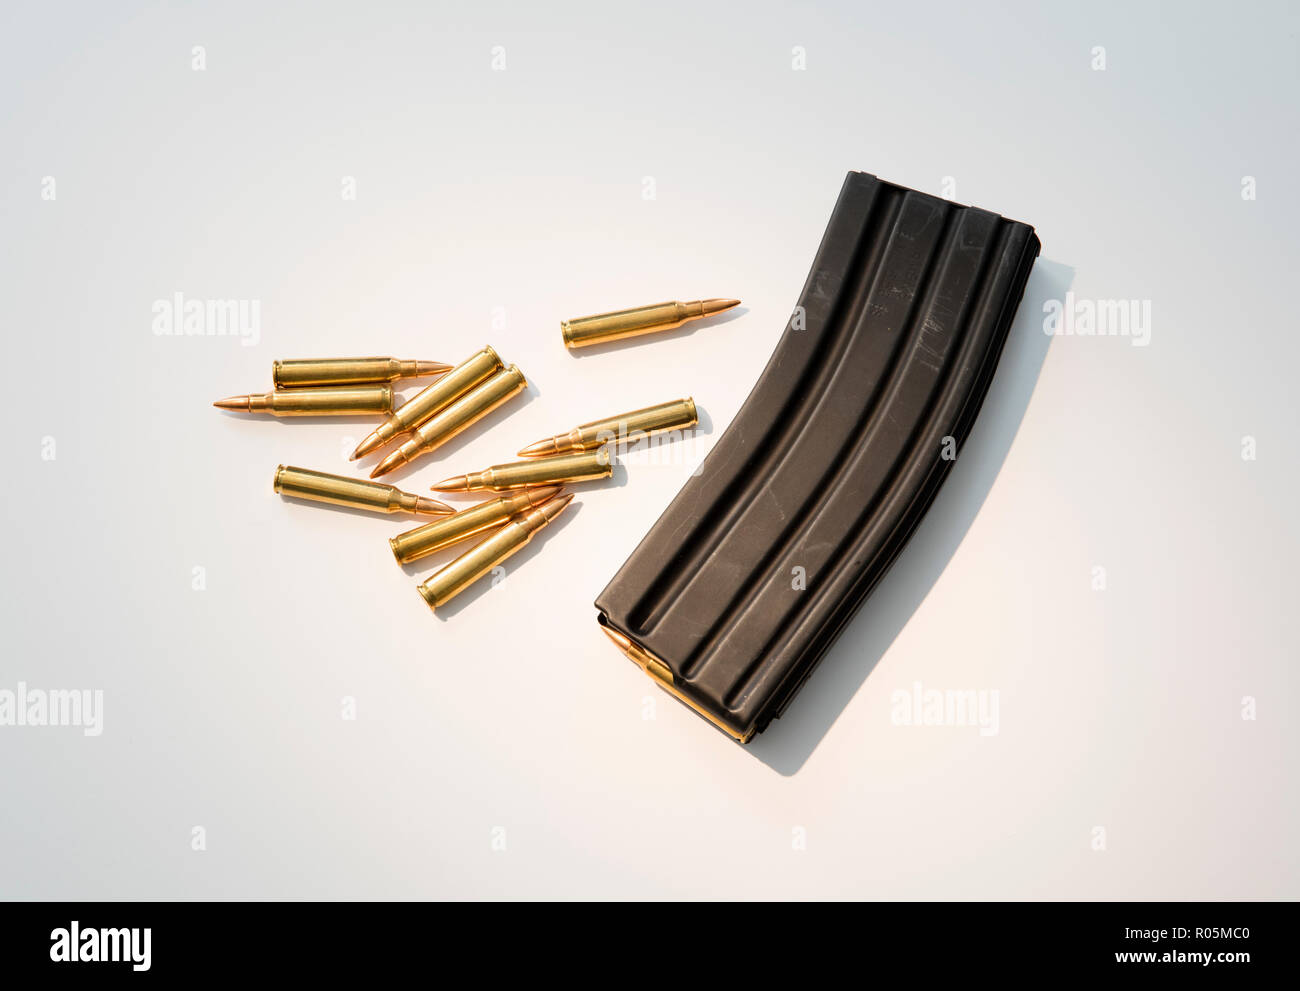 High capacity assault rifle ammunition magazine with live ammunition. - Stock Image